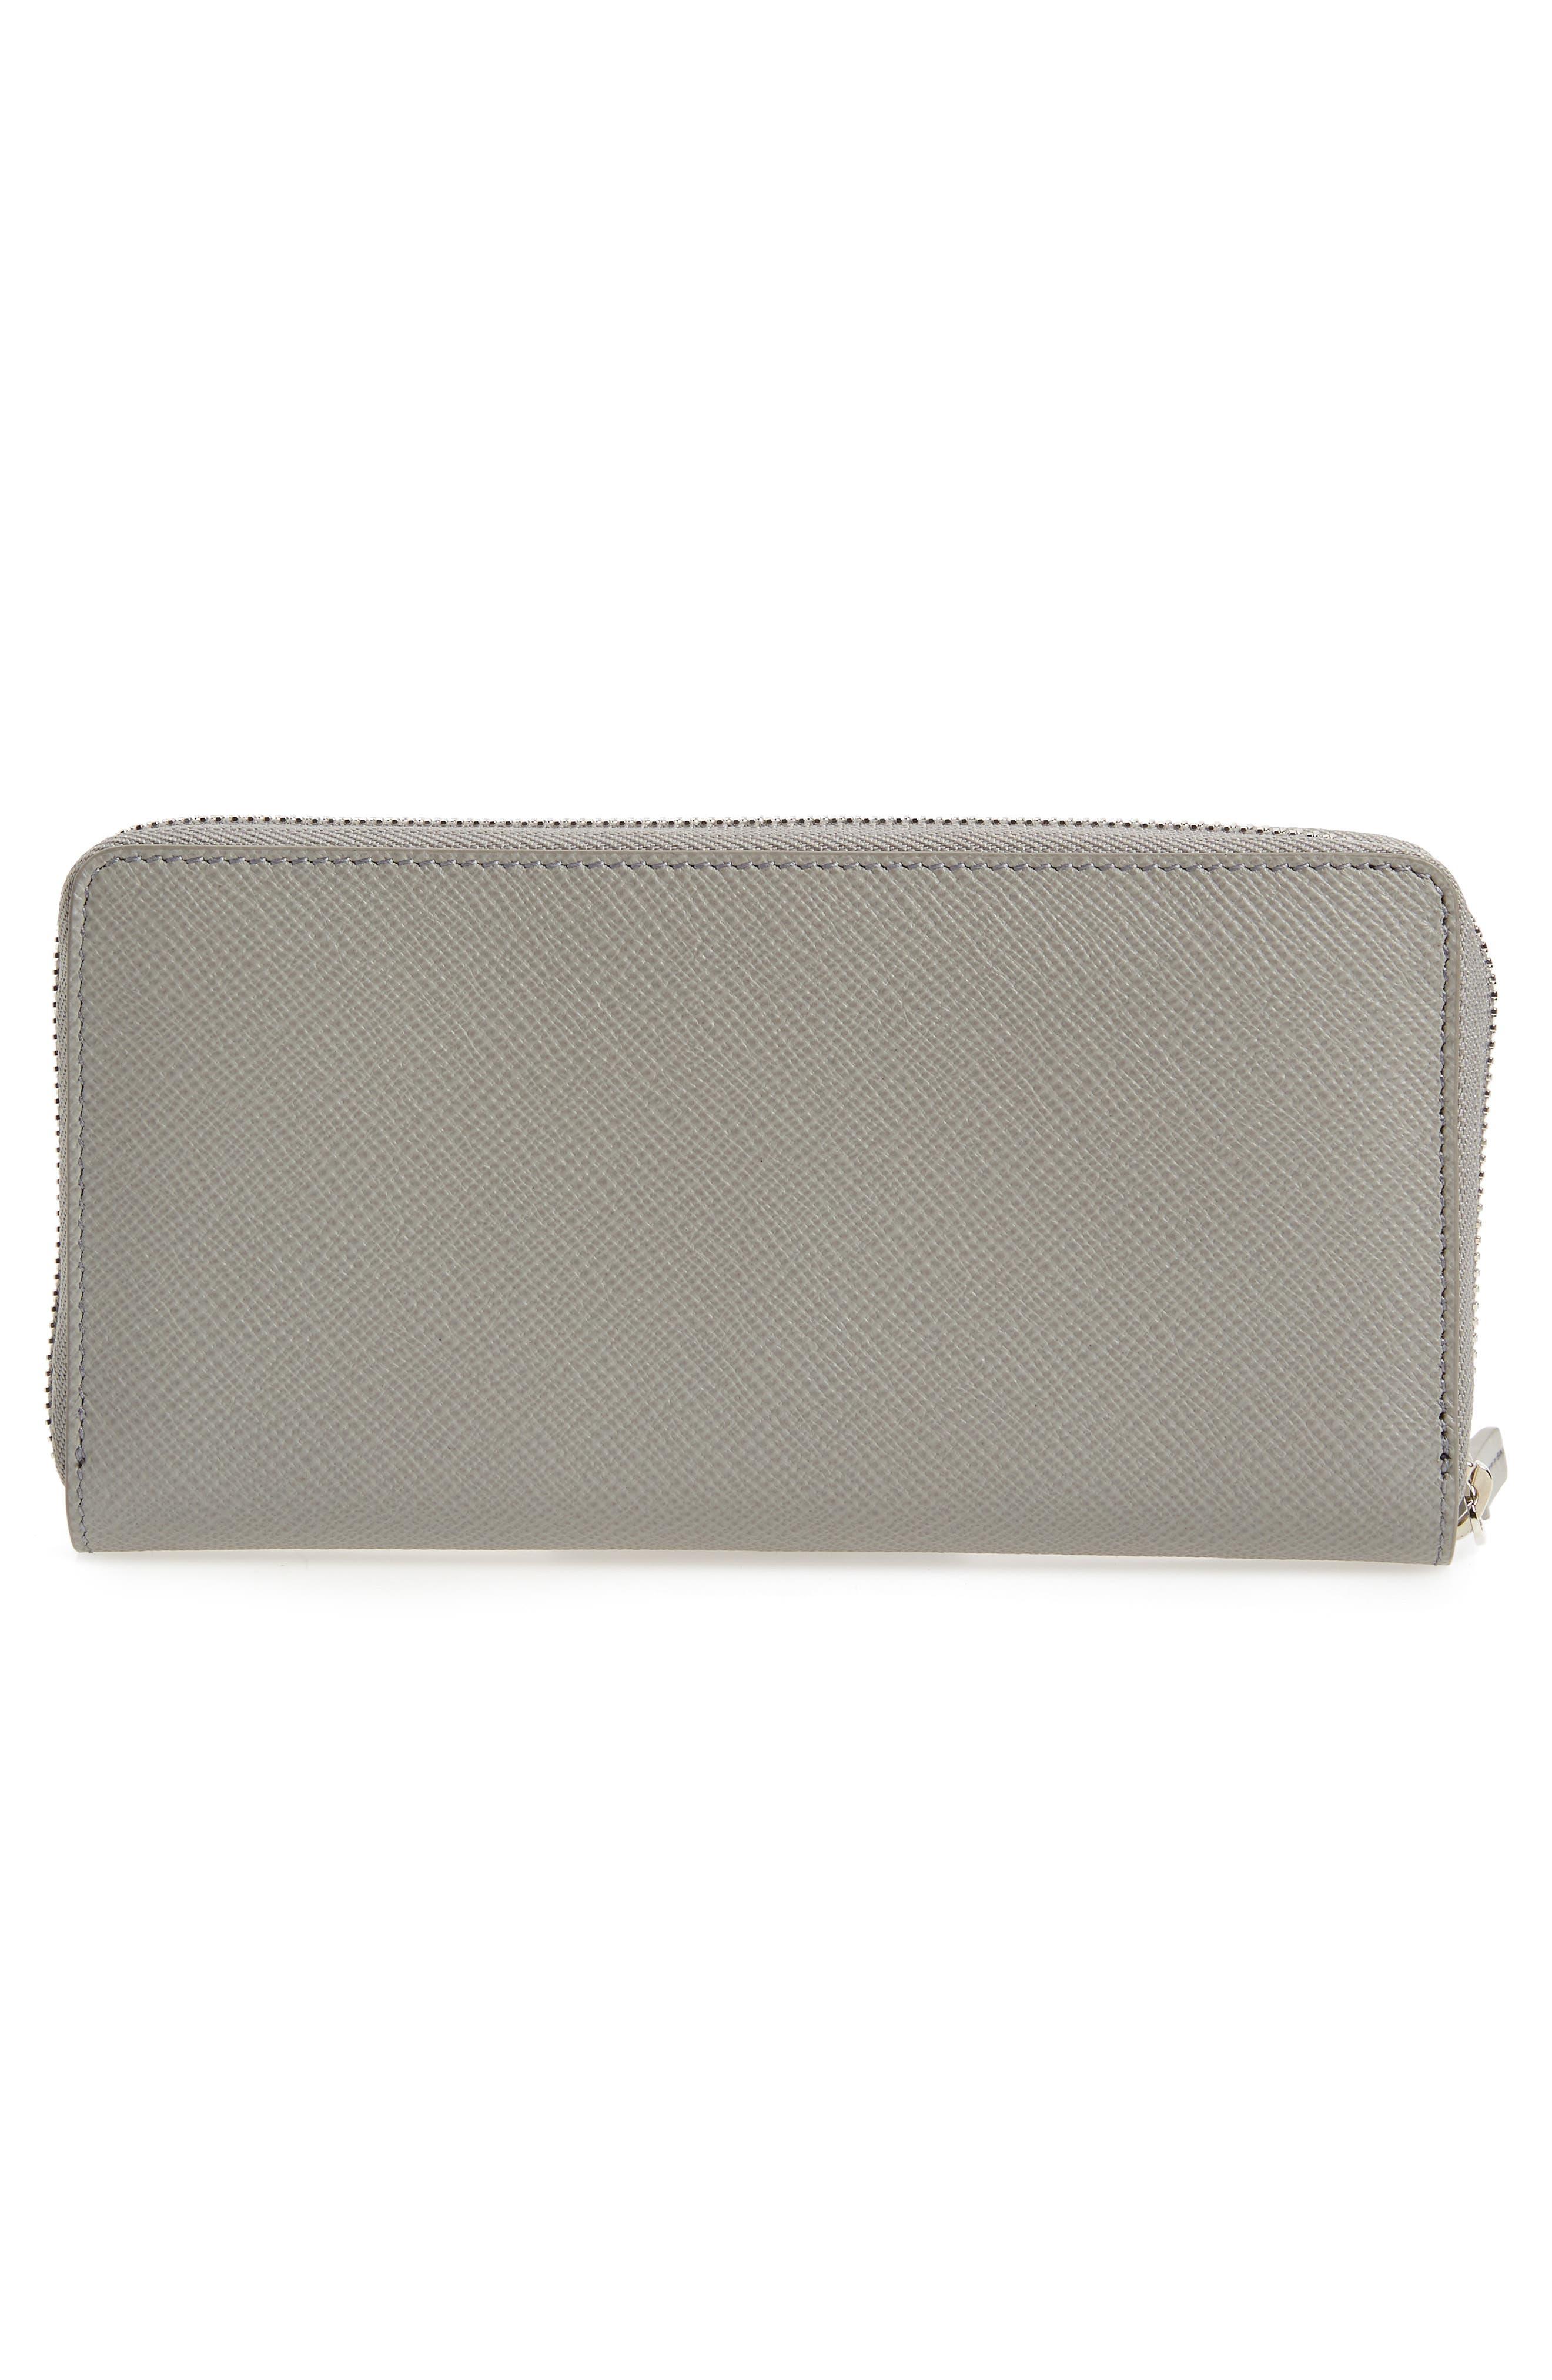 Large Panama Zip Around Wallet,                             Alternate thumbnail 4, color,                             Cold Grey